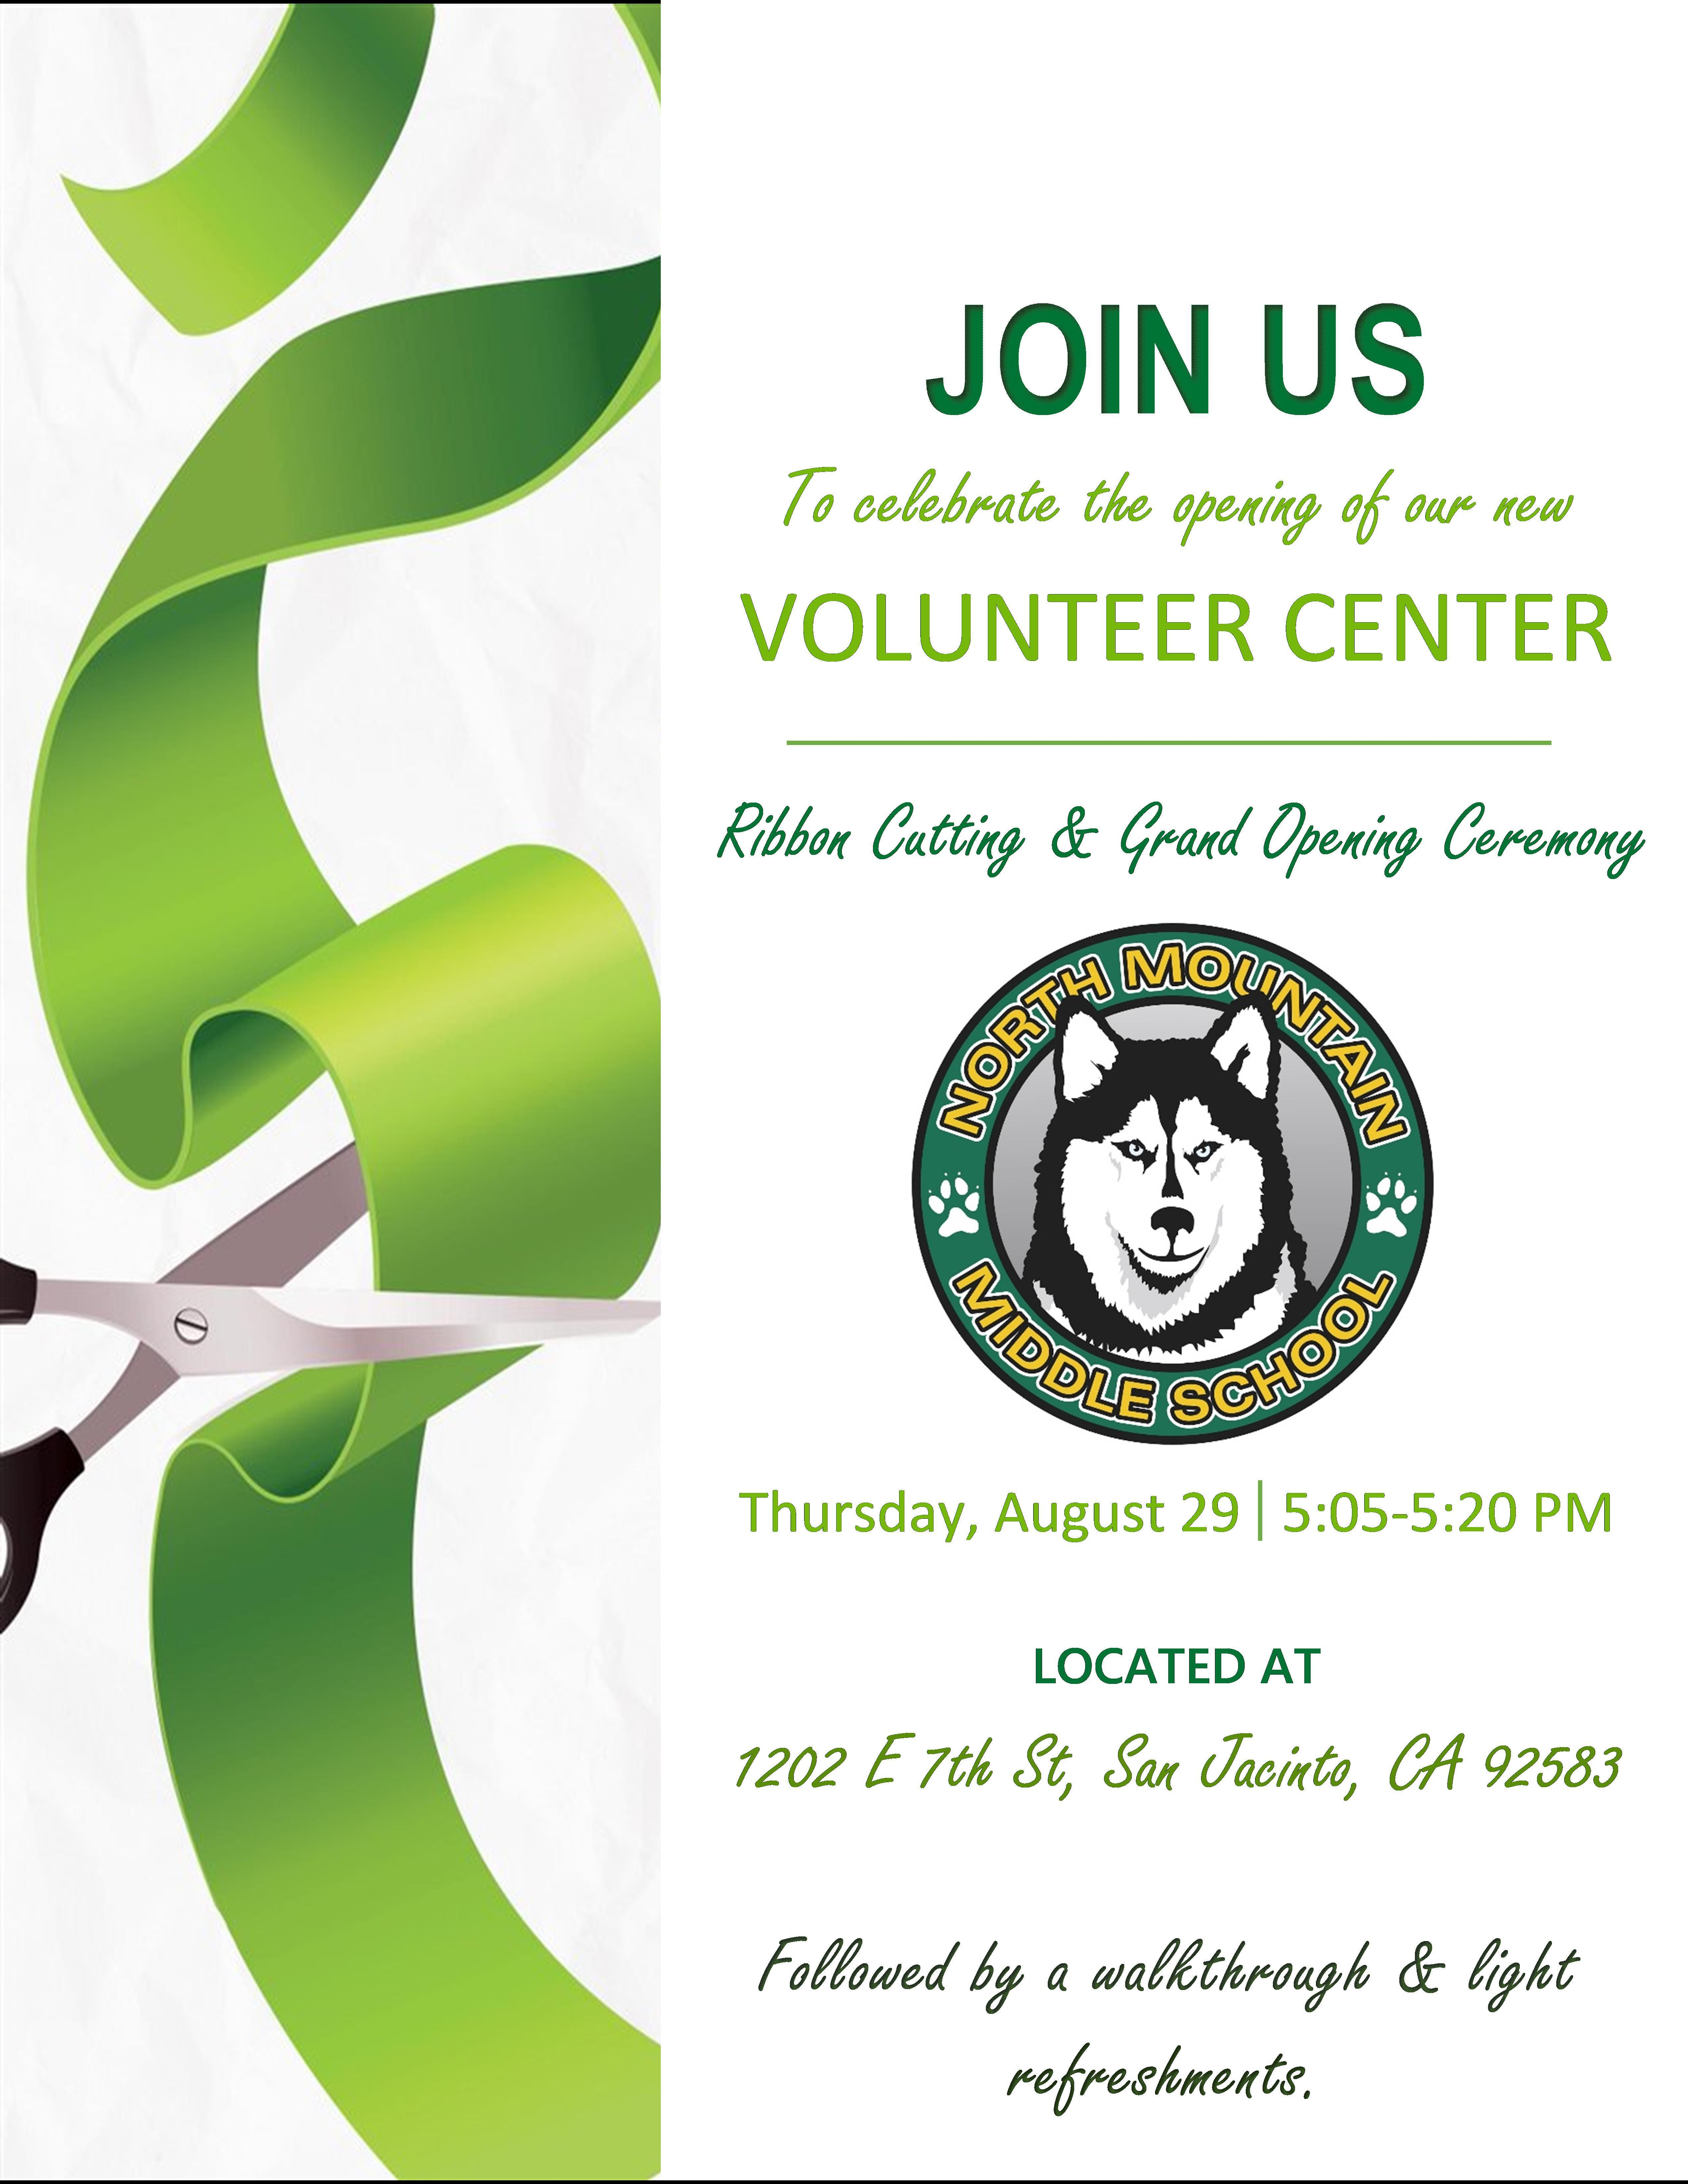 NMMS Volunteer Center GRAND OPENING!